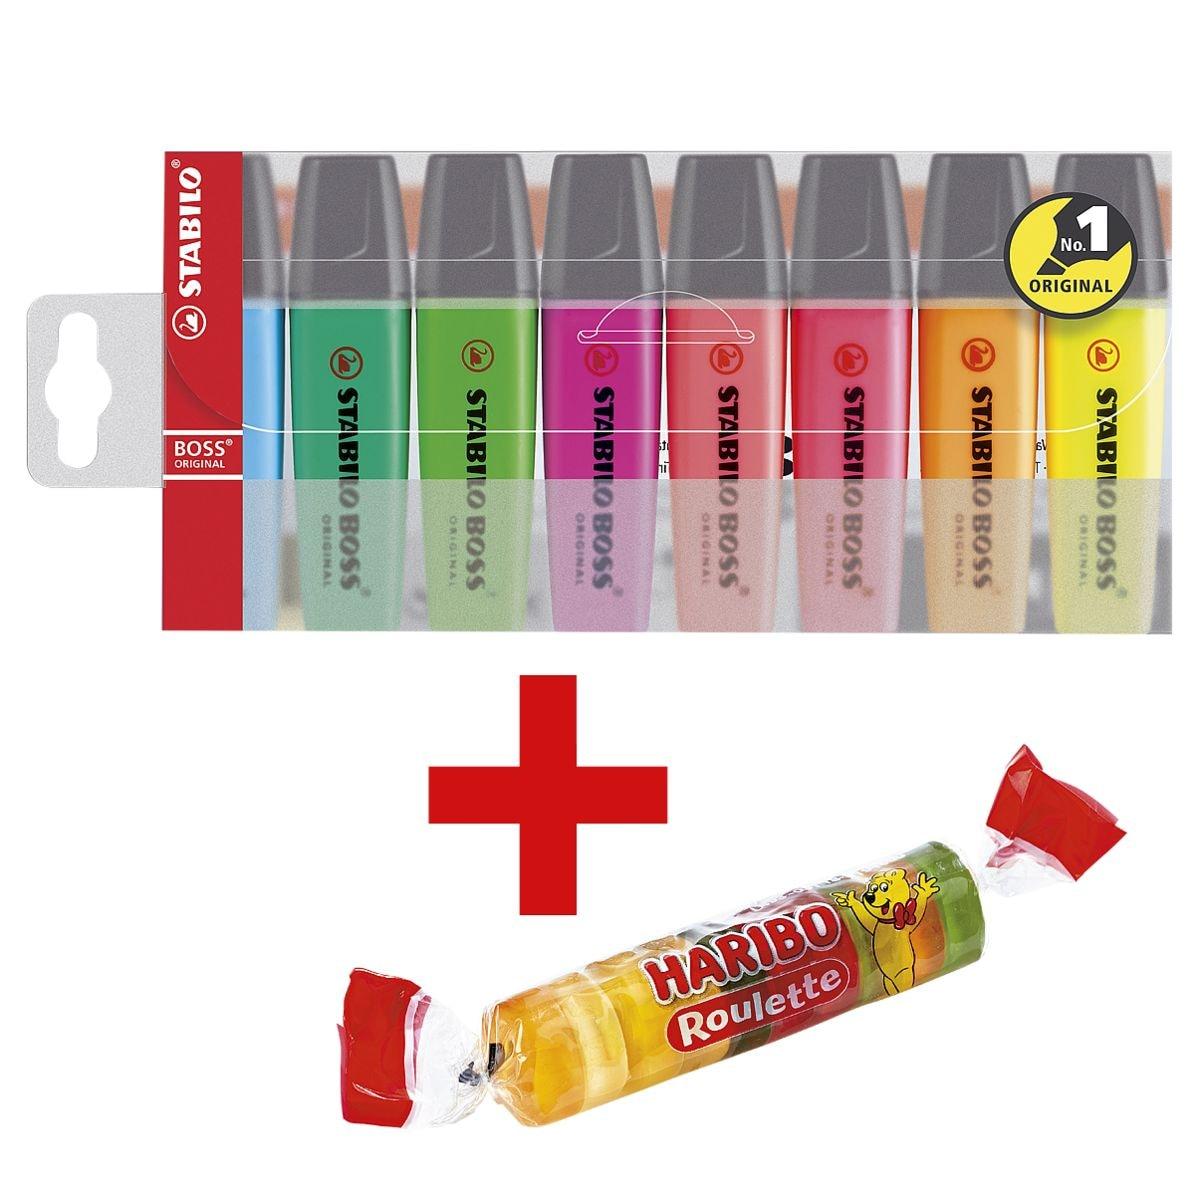 STABILO Markeerstift BOSS® Original, navulbaar, schuine punt, incl. Vruchtengums »Roulette« 25 g